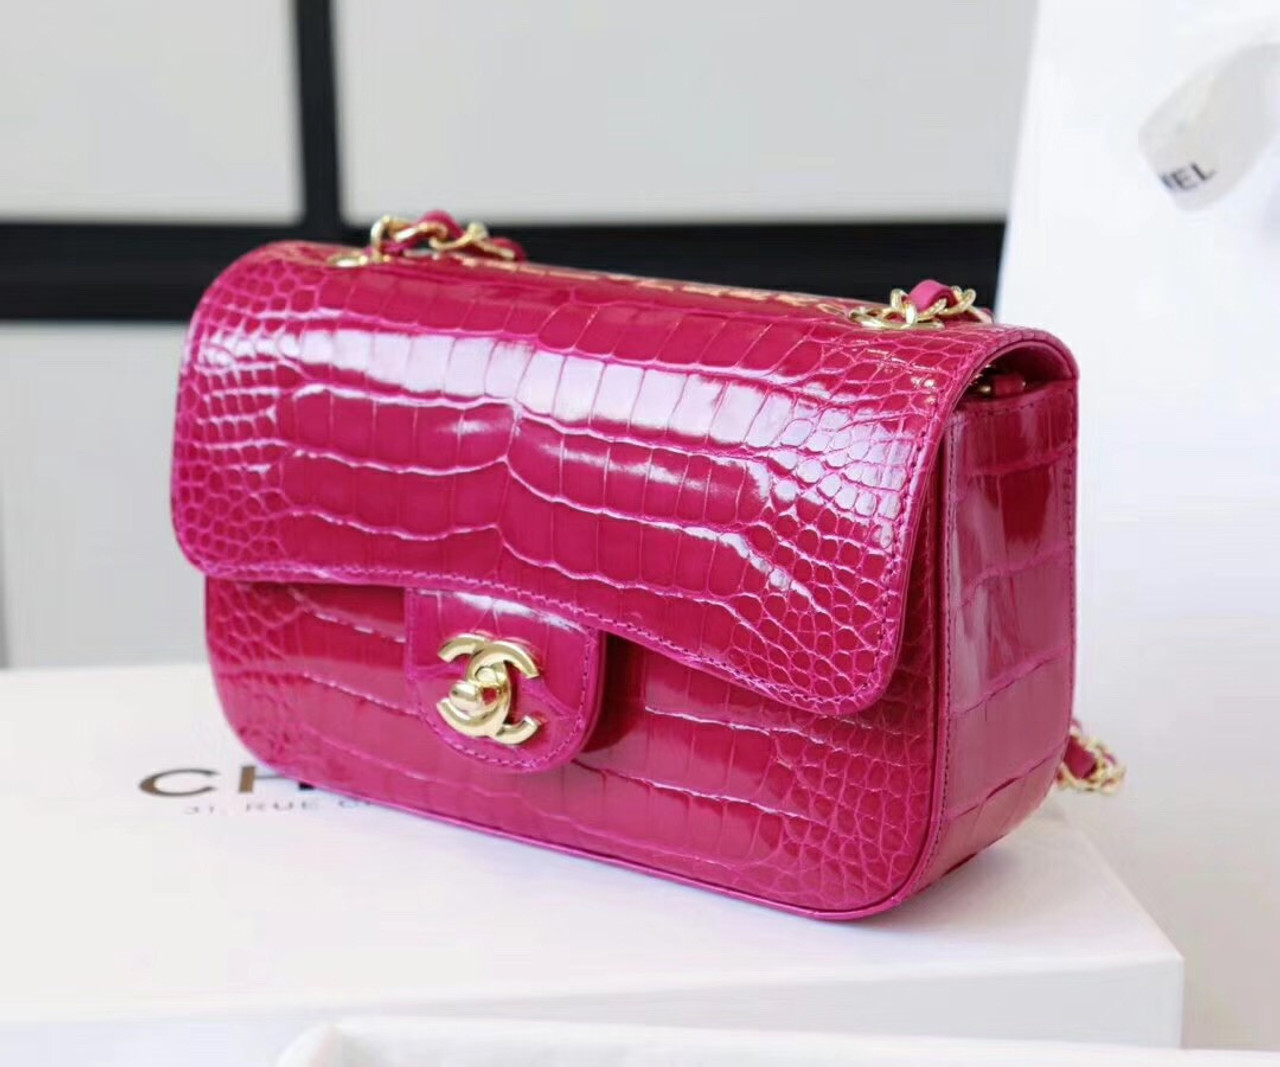 9994a927863c Chanel Fuchsia Shinny Alligator Mini Flap Bag - Bella Vita Moda